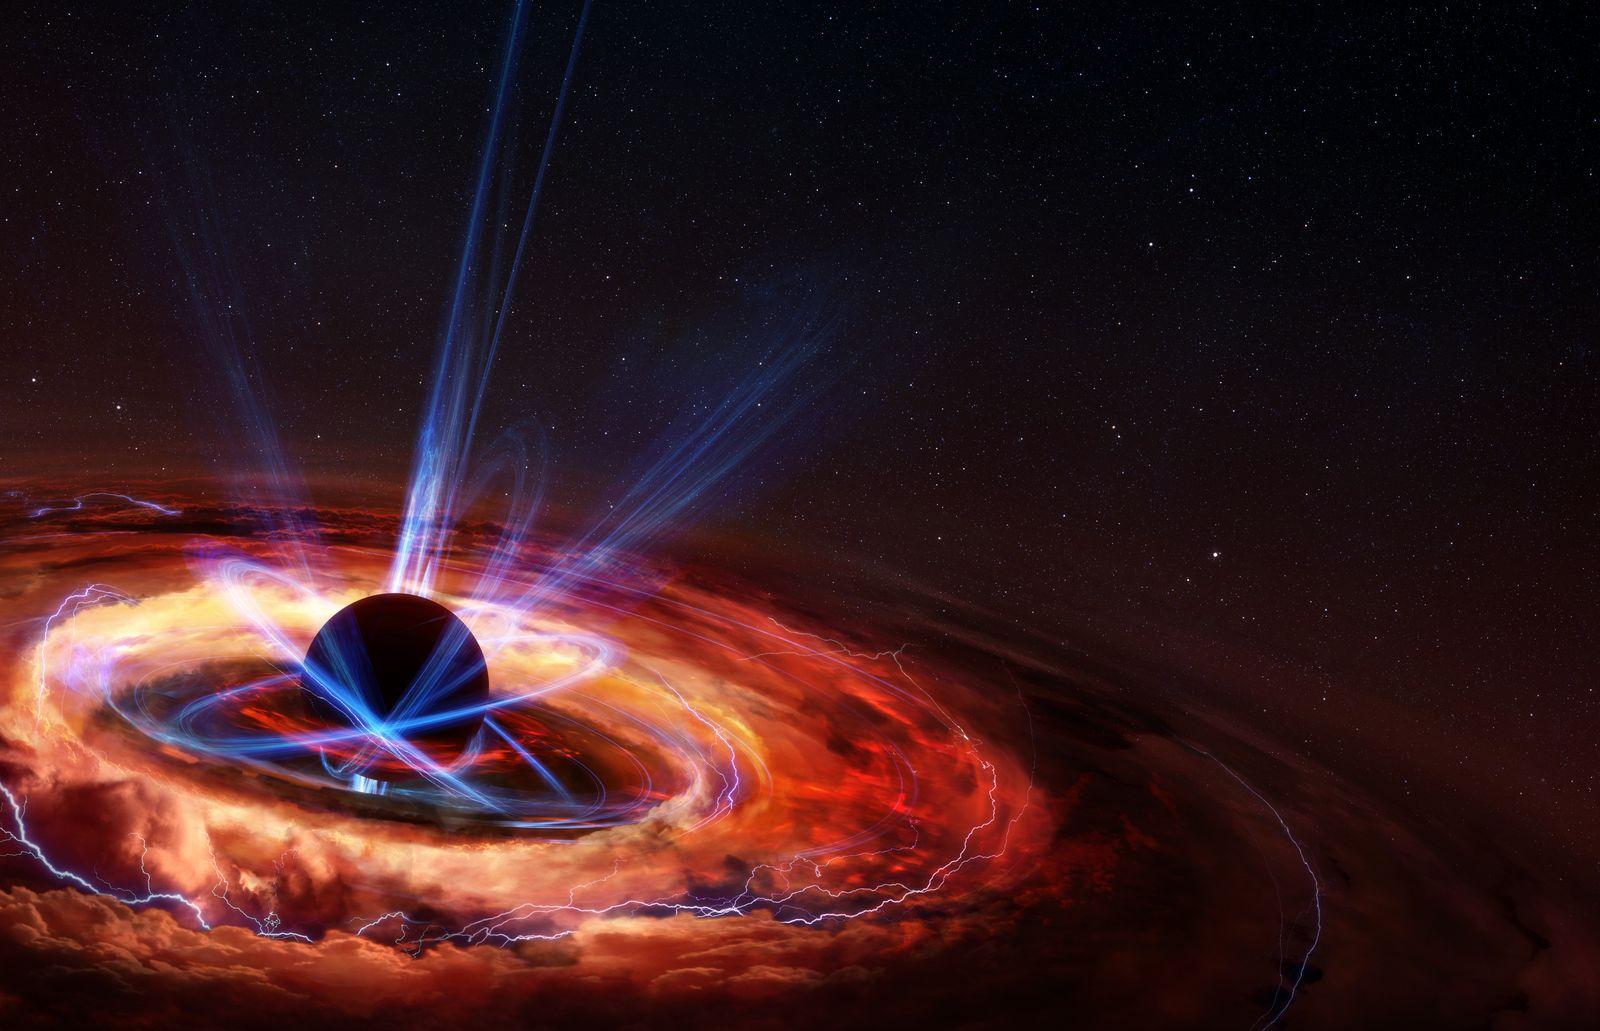 Collapsing Star & Black Hole Illustration